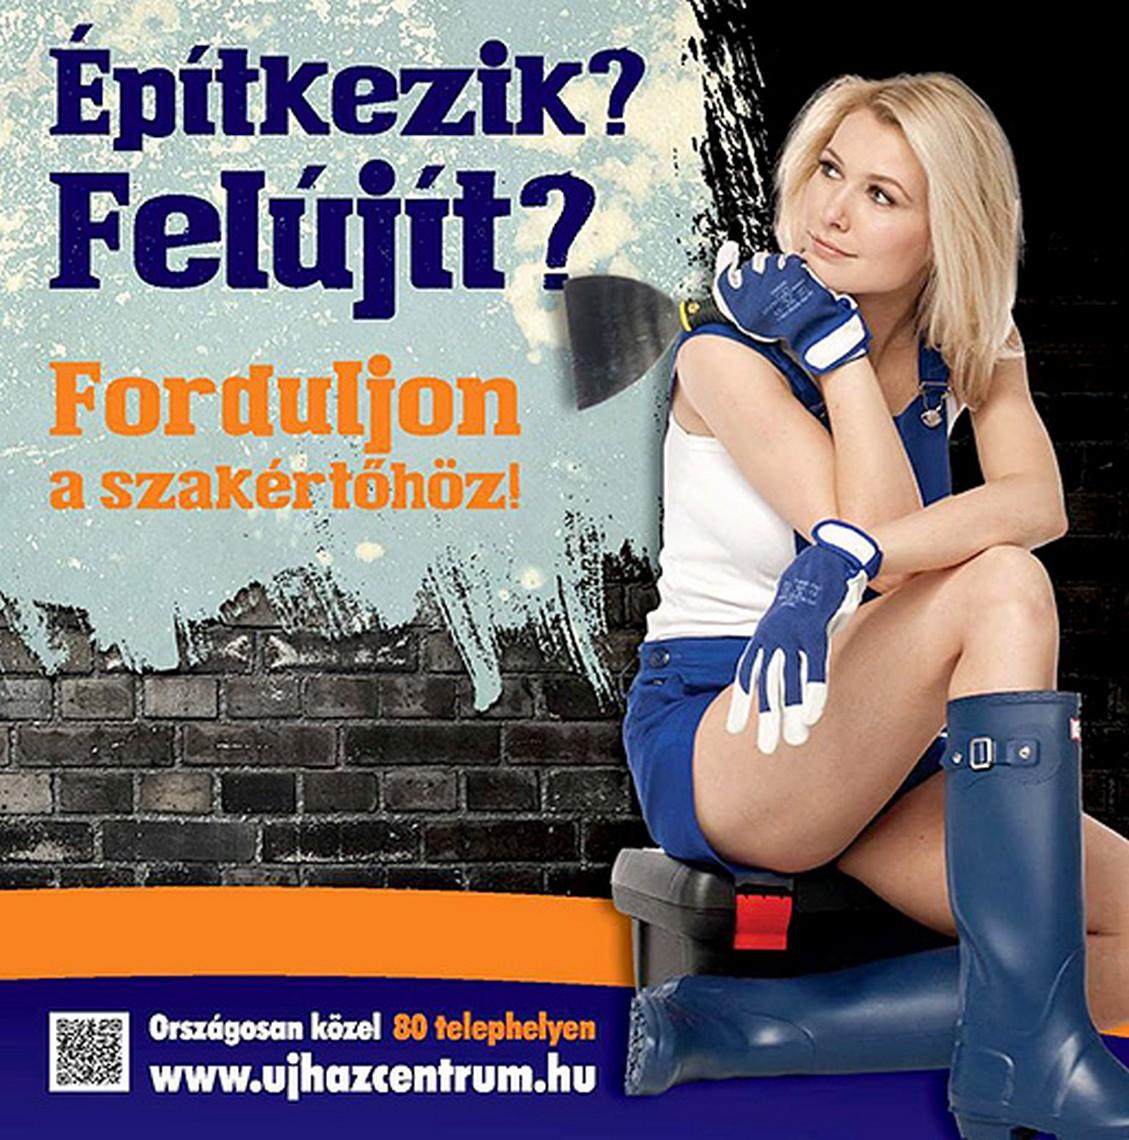 Advertisement-07